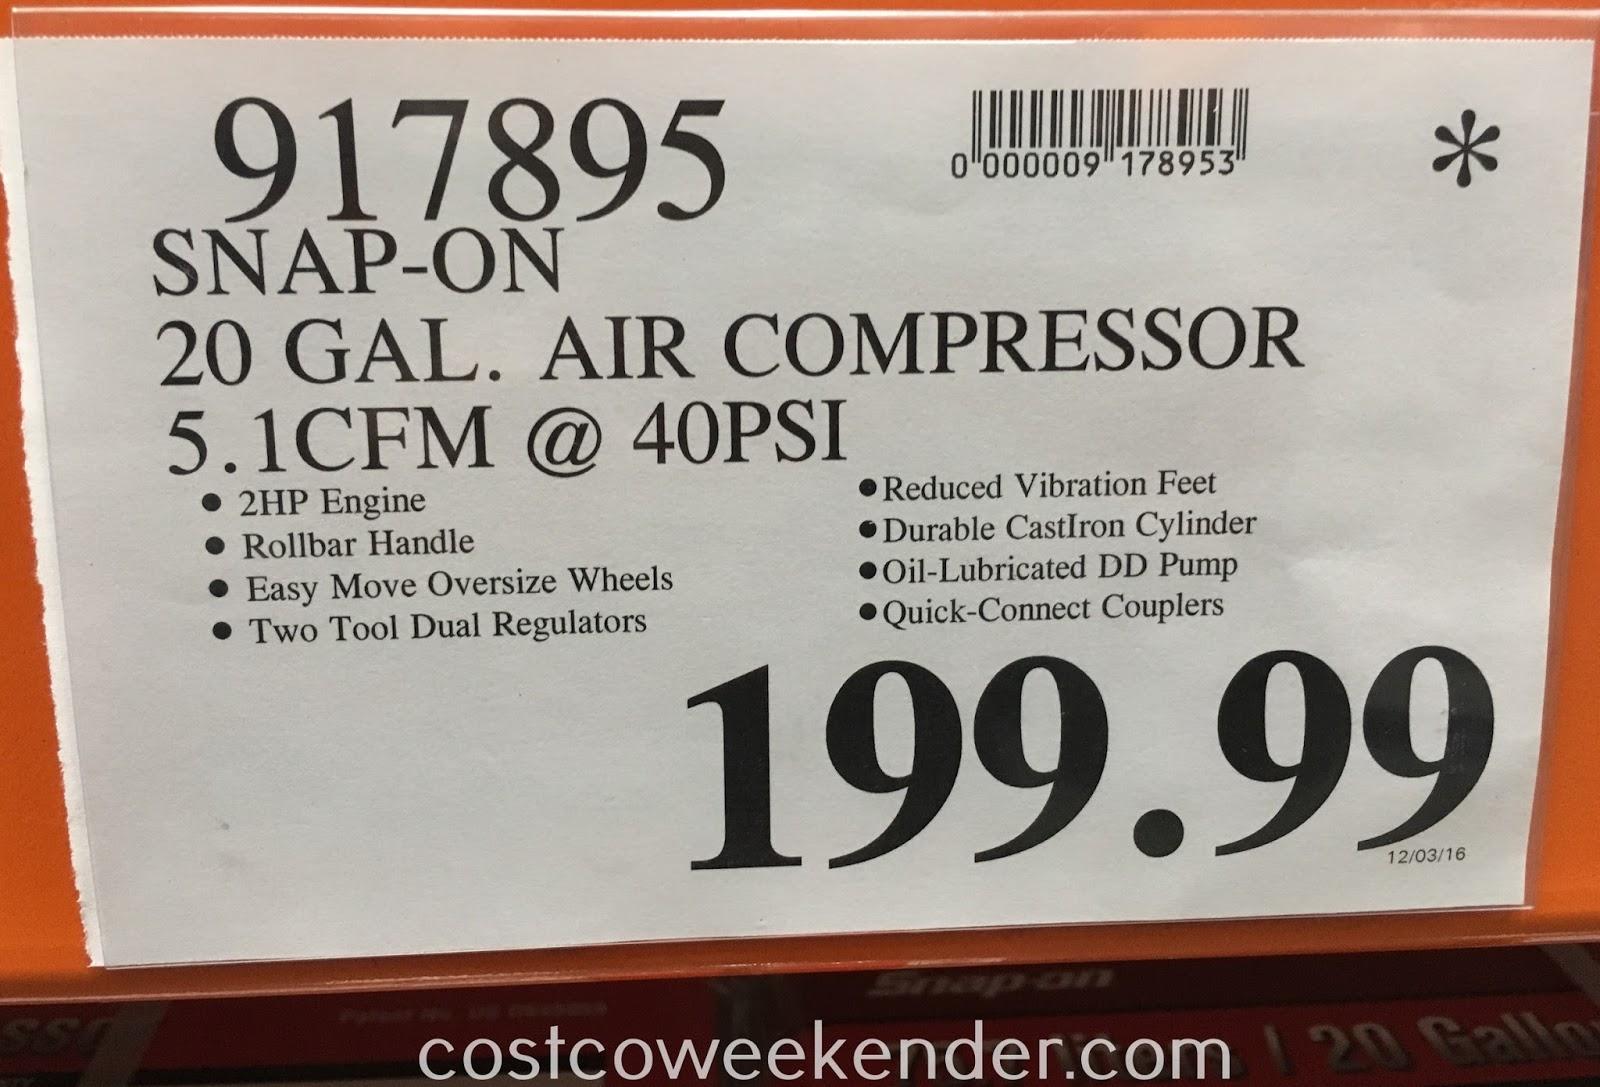 Costco 917895 Deal For The Snap On 20 Gallon Air Compressor At Costco